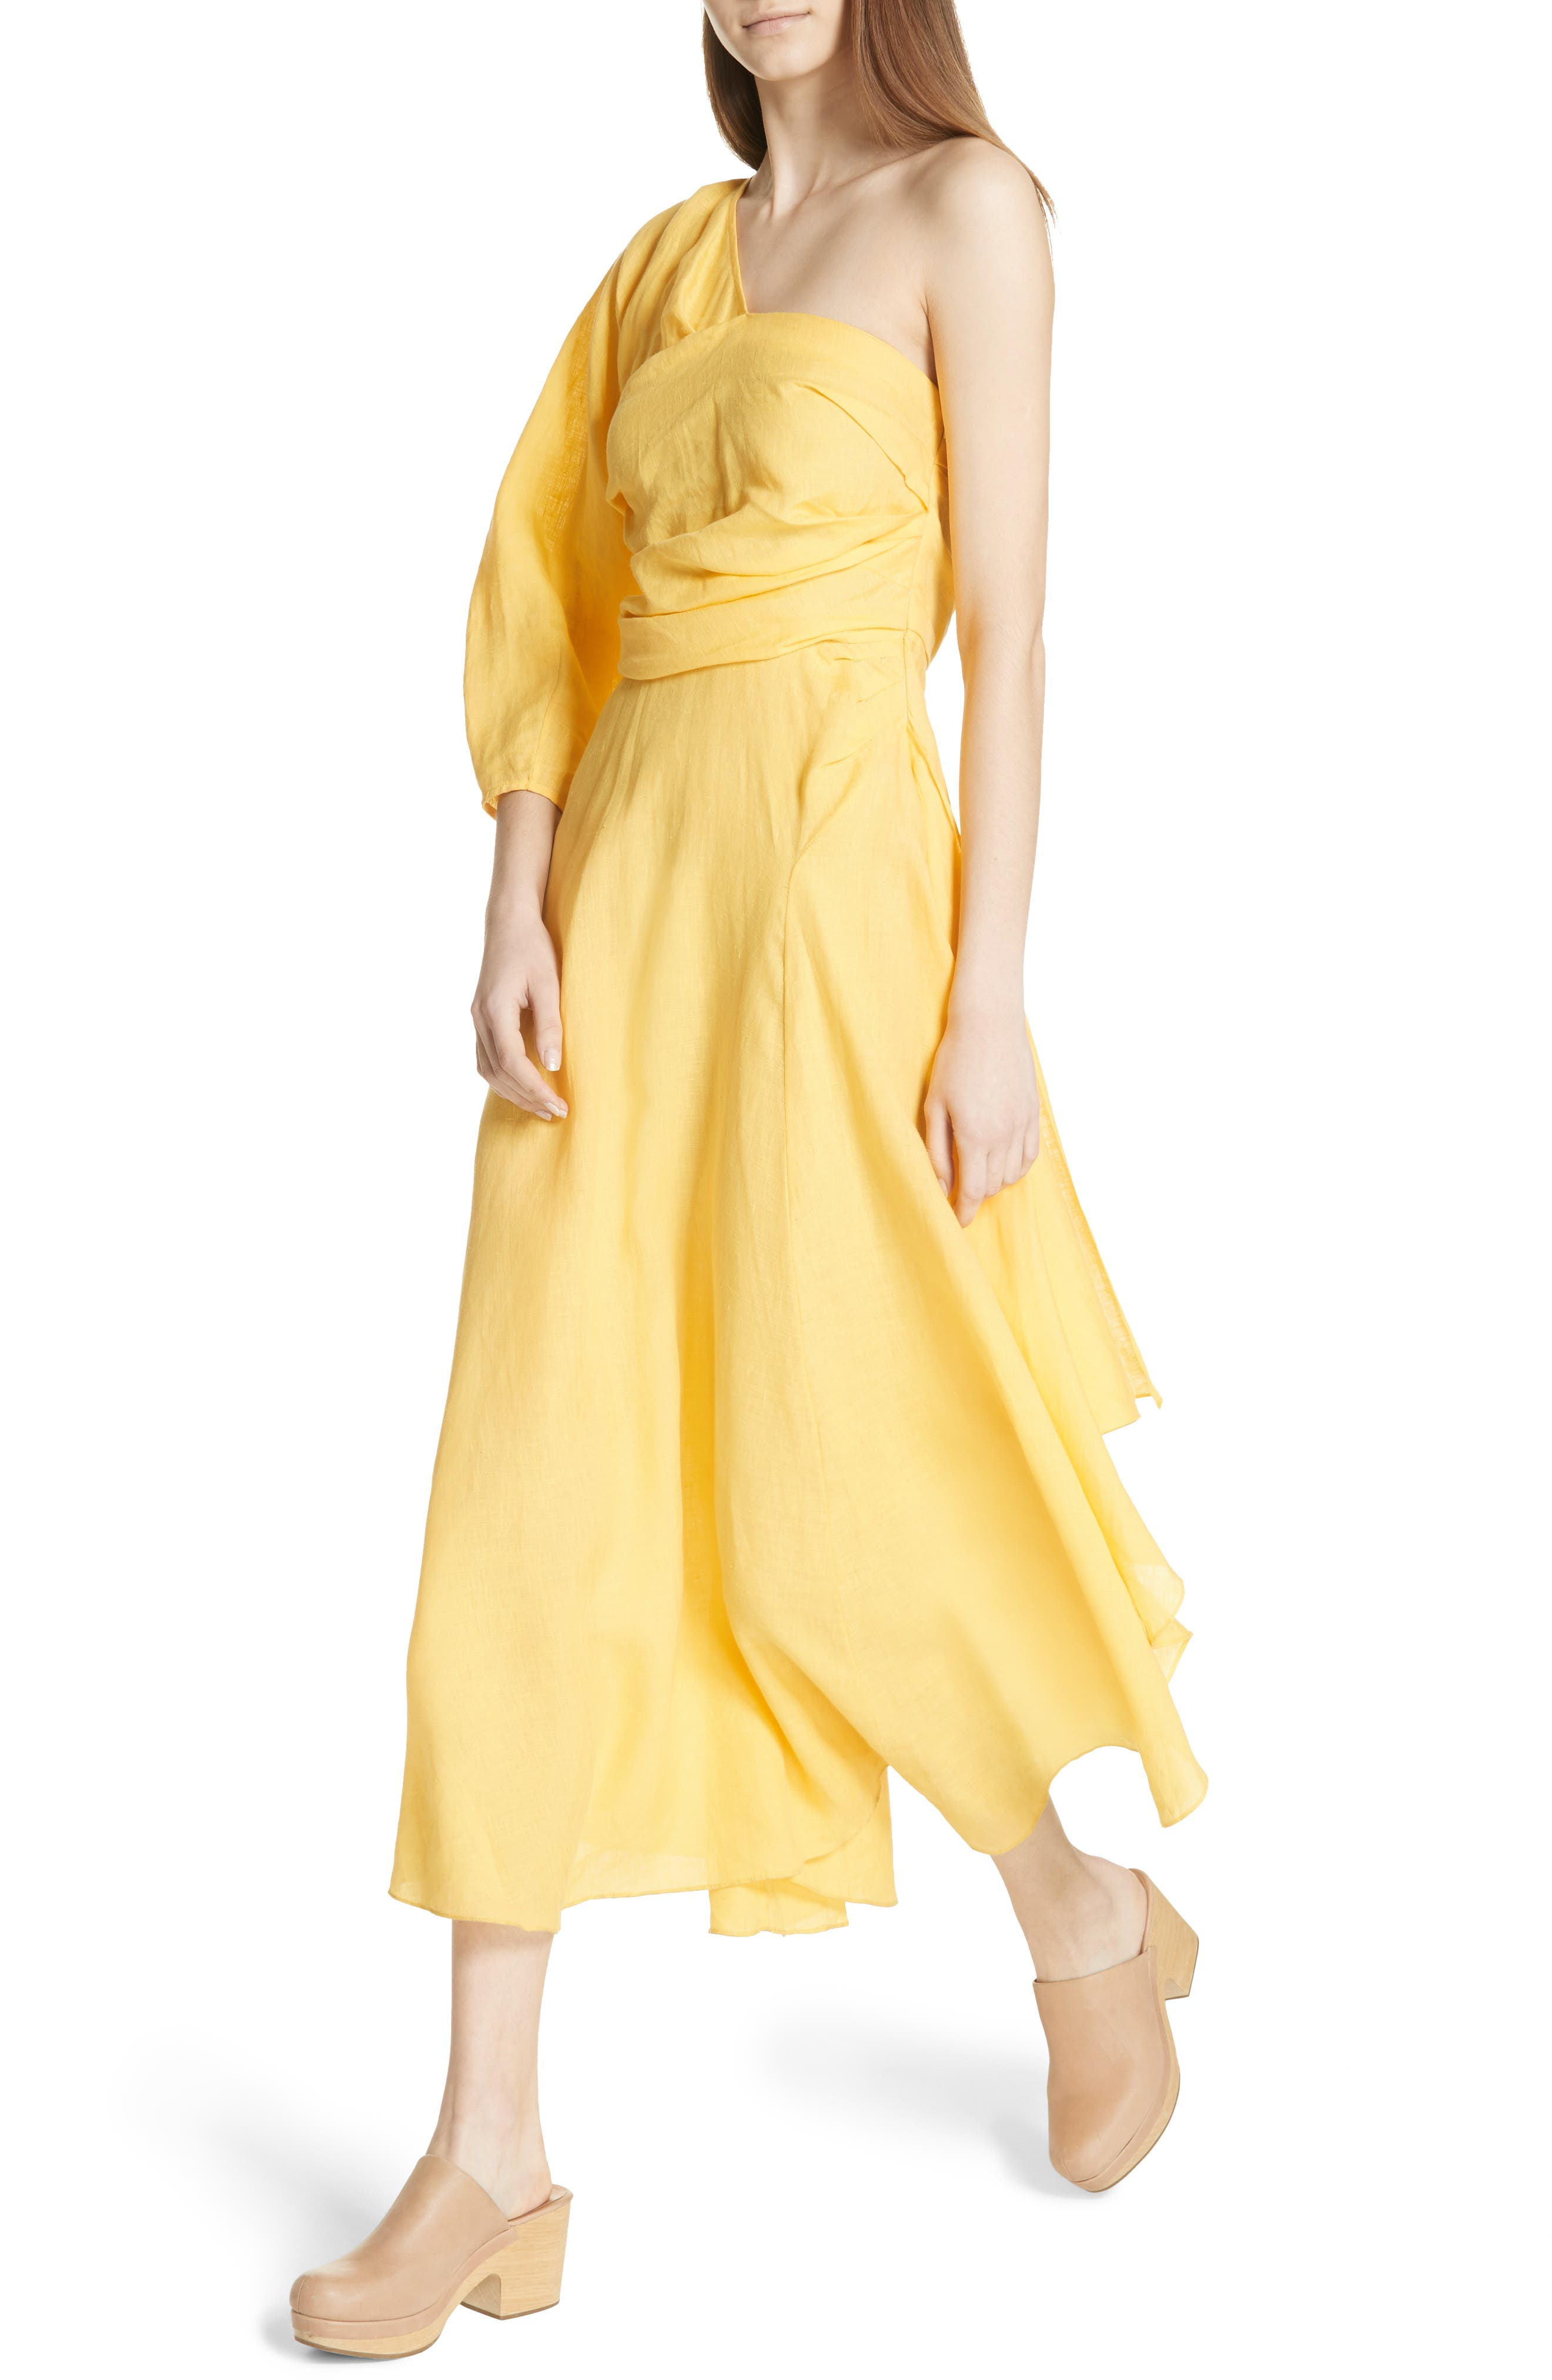 Tipple One-Shoulder Dress,                             Alternate thumbnail 4, color,                             YELLOW